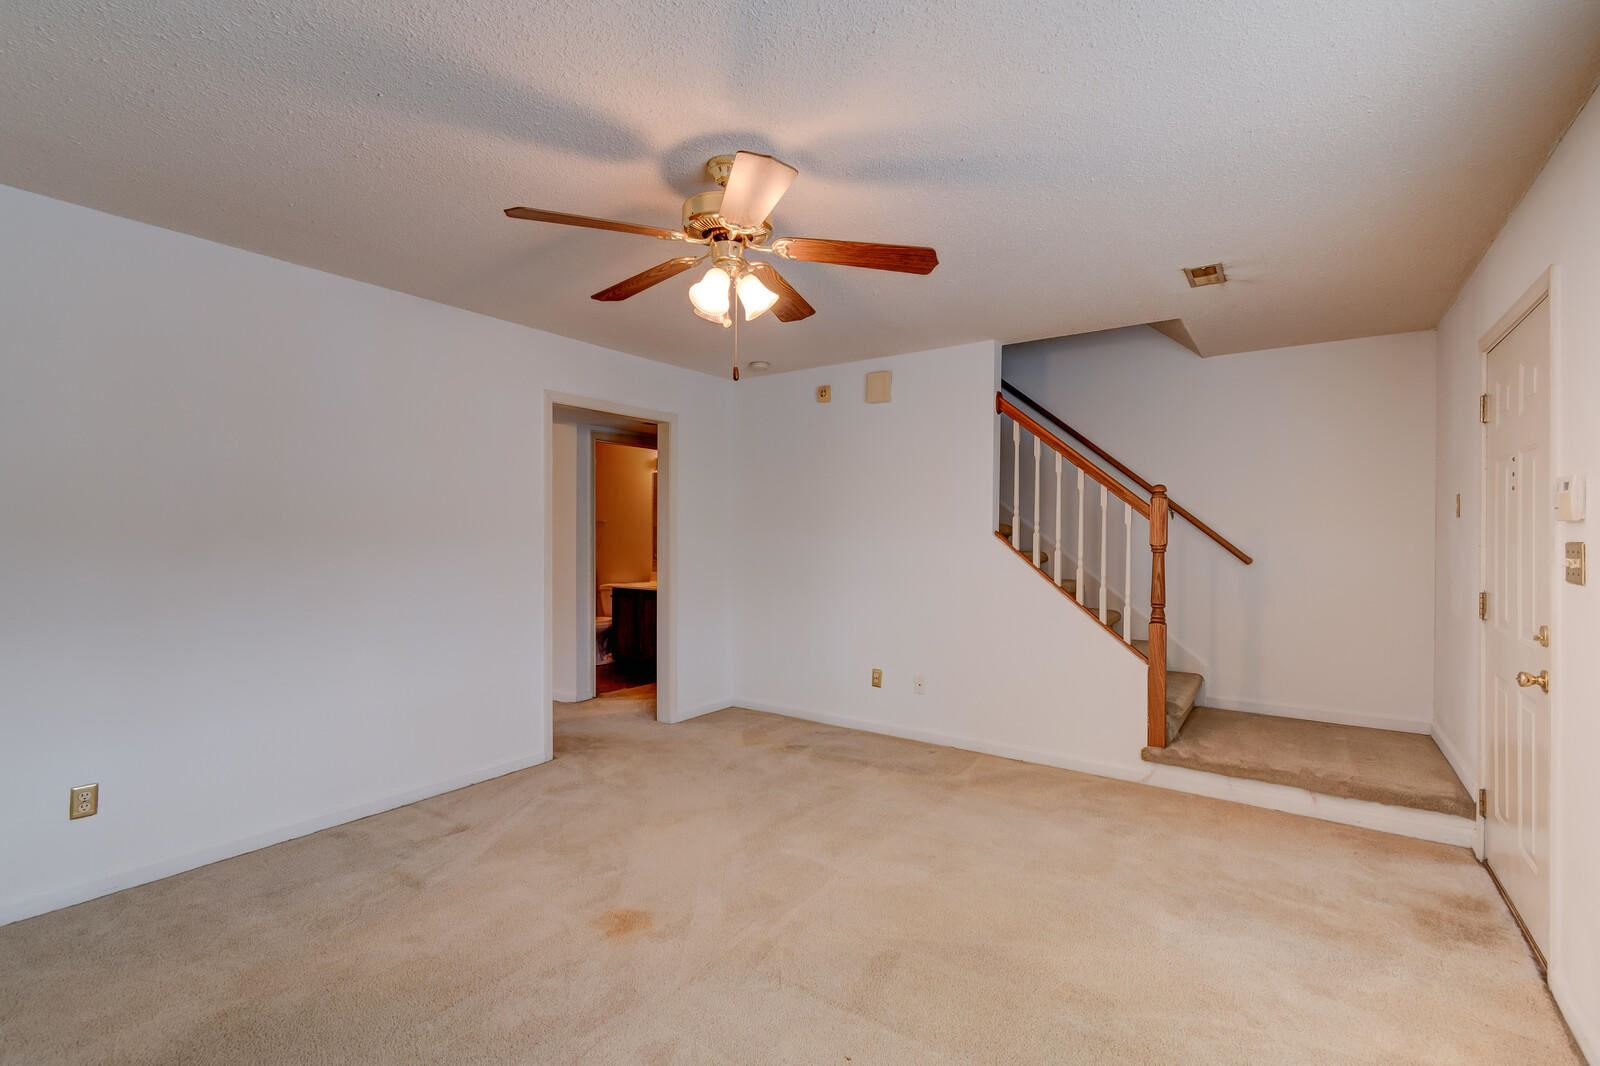 Photo of 3213 Quiet Way, Knoxville, TN 37918 (MLS # 1140998)